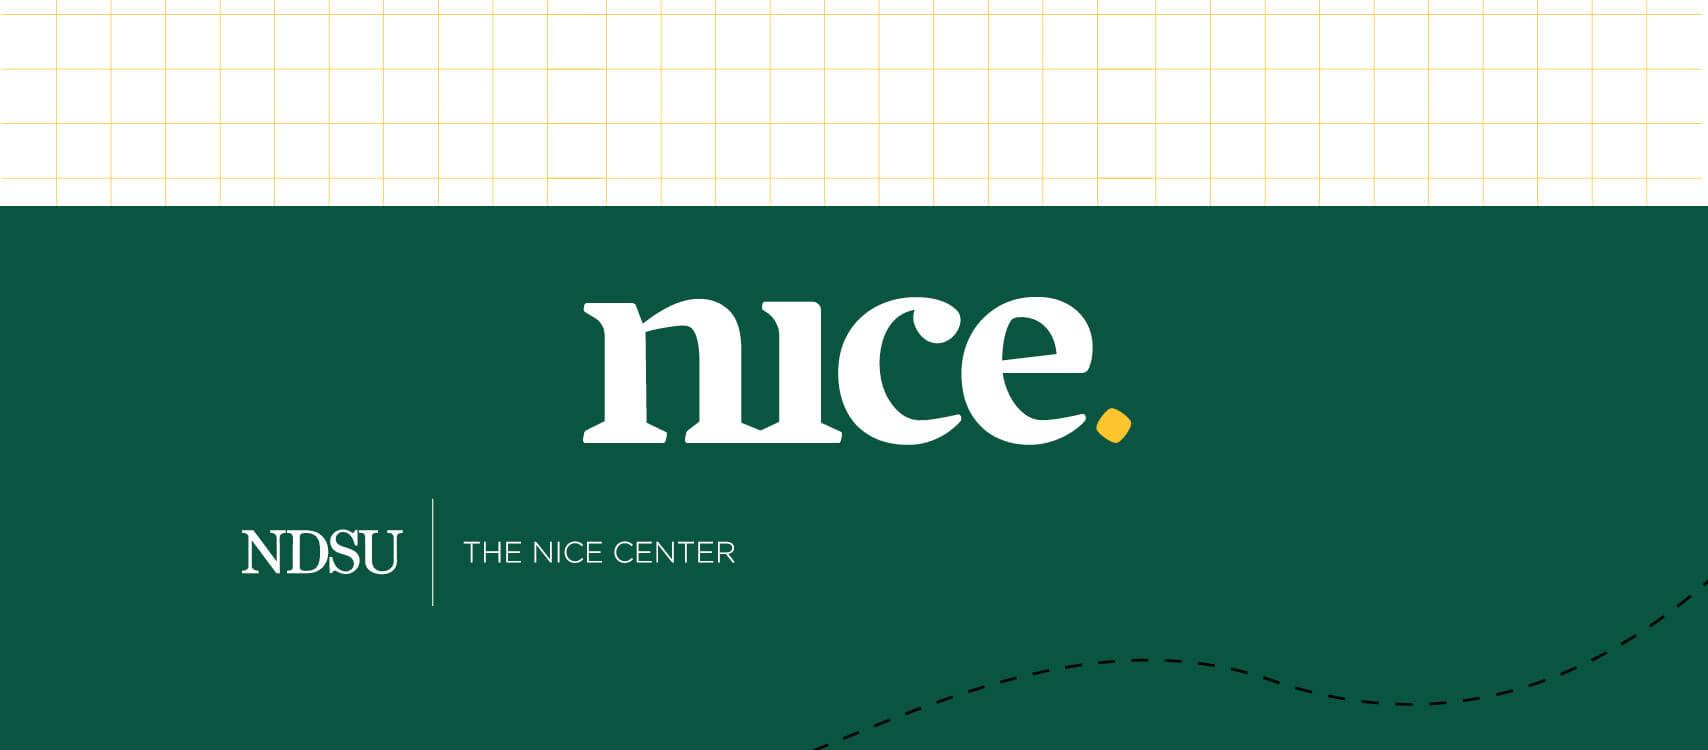 NDSU Nice Center